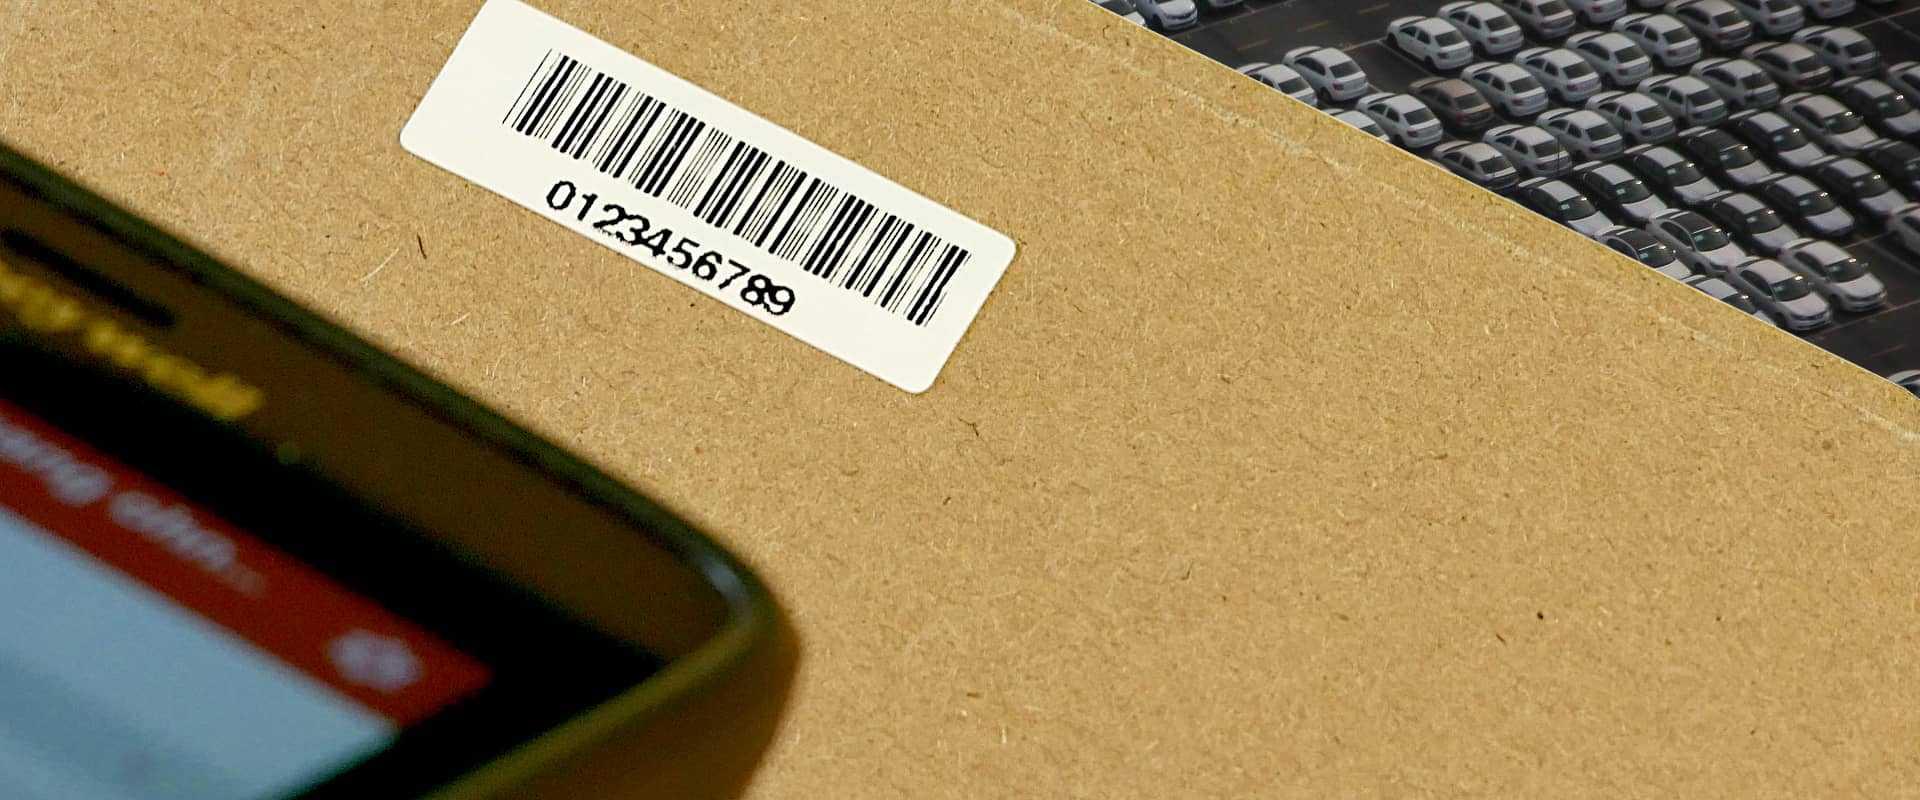 COSYS Inhouse Logistik Software